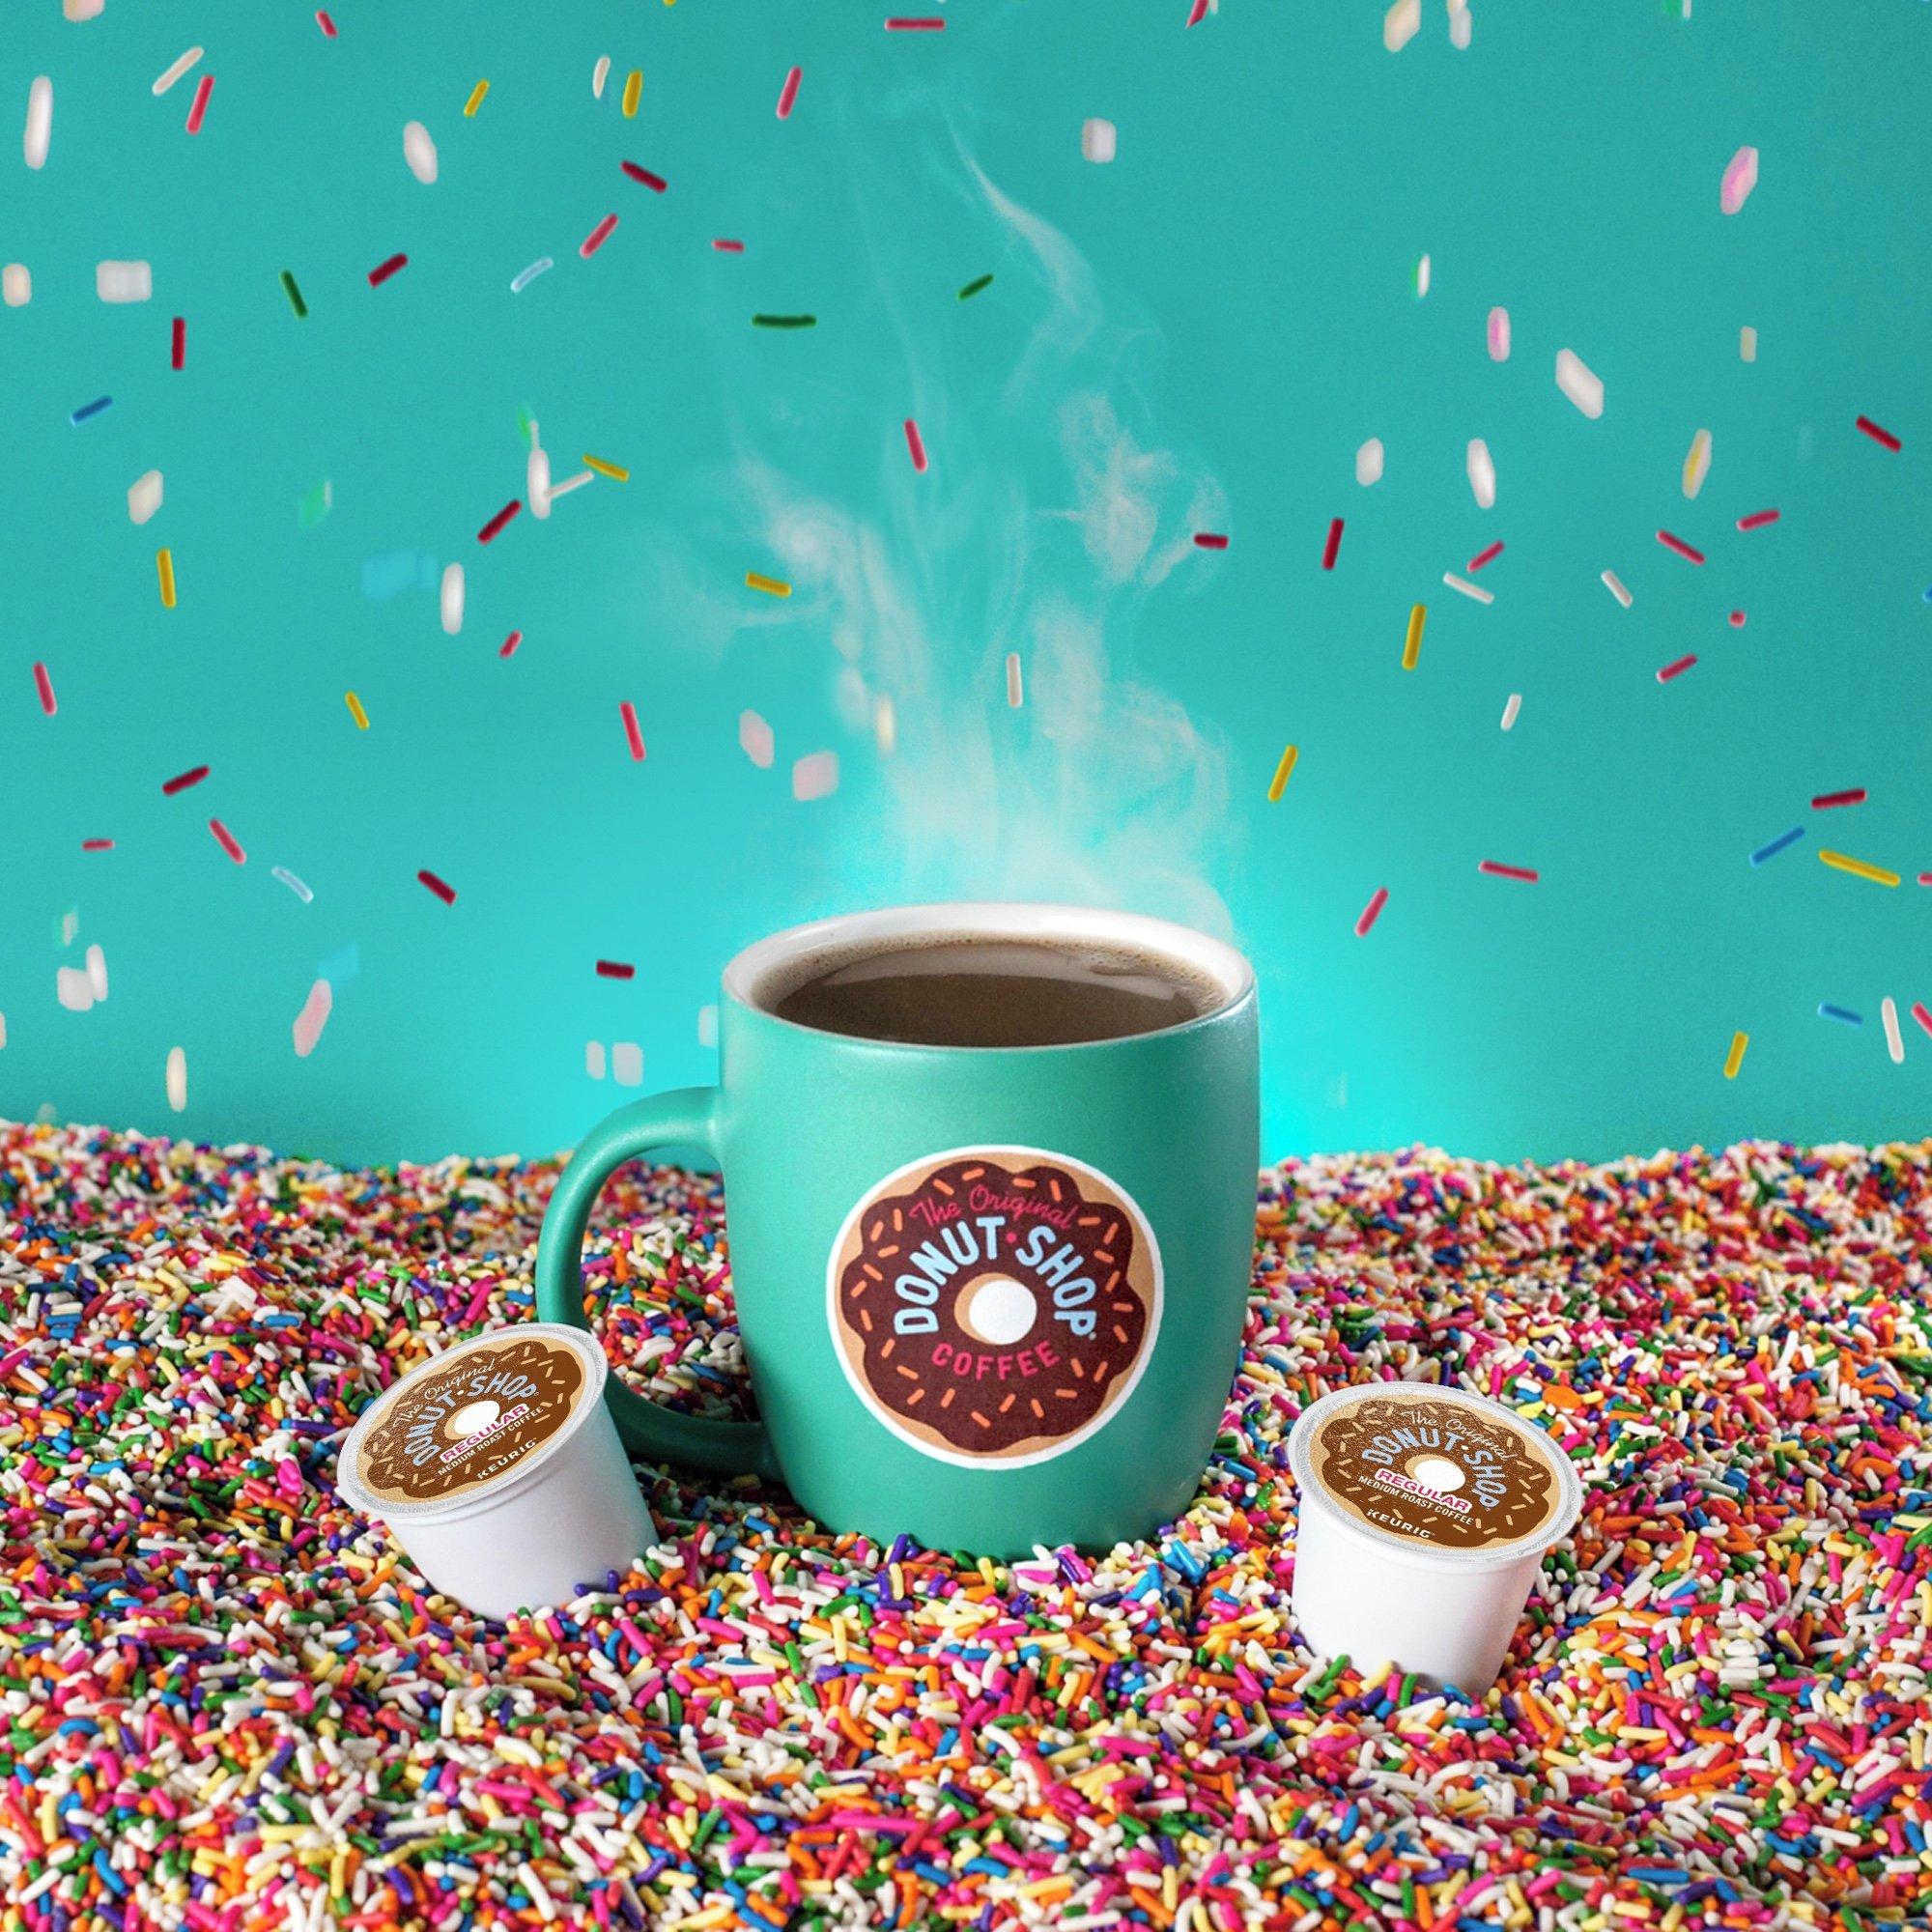 The Original Donut Shop Coffee, Regular Medium Roast, K-Cup Portion Count for Keurig Brewers 24-Count (Pack of 4) by The Original Donut Shop (Image #8)